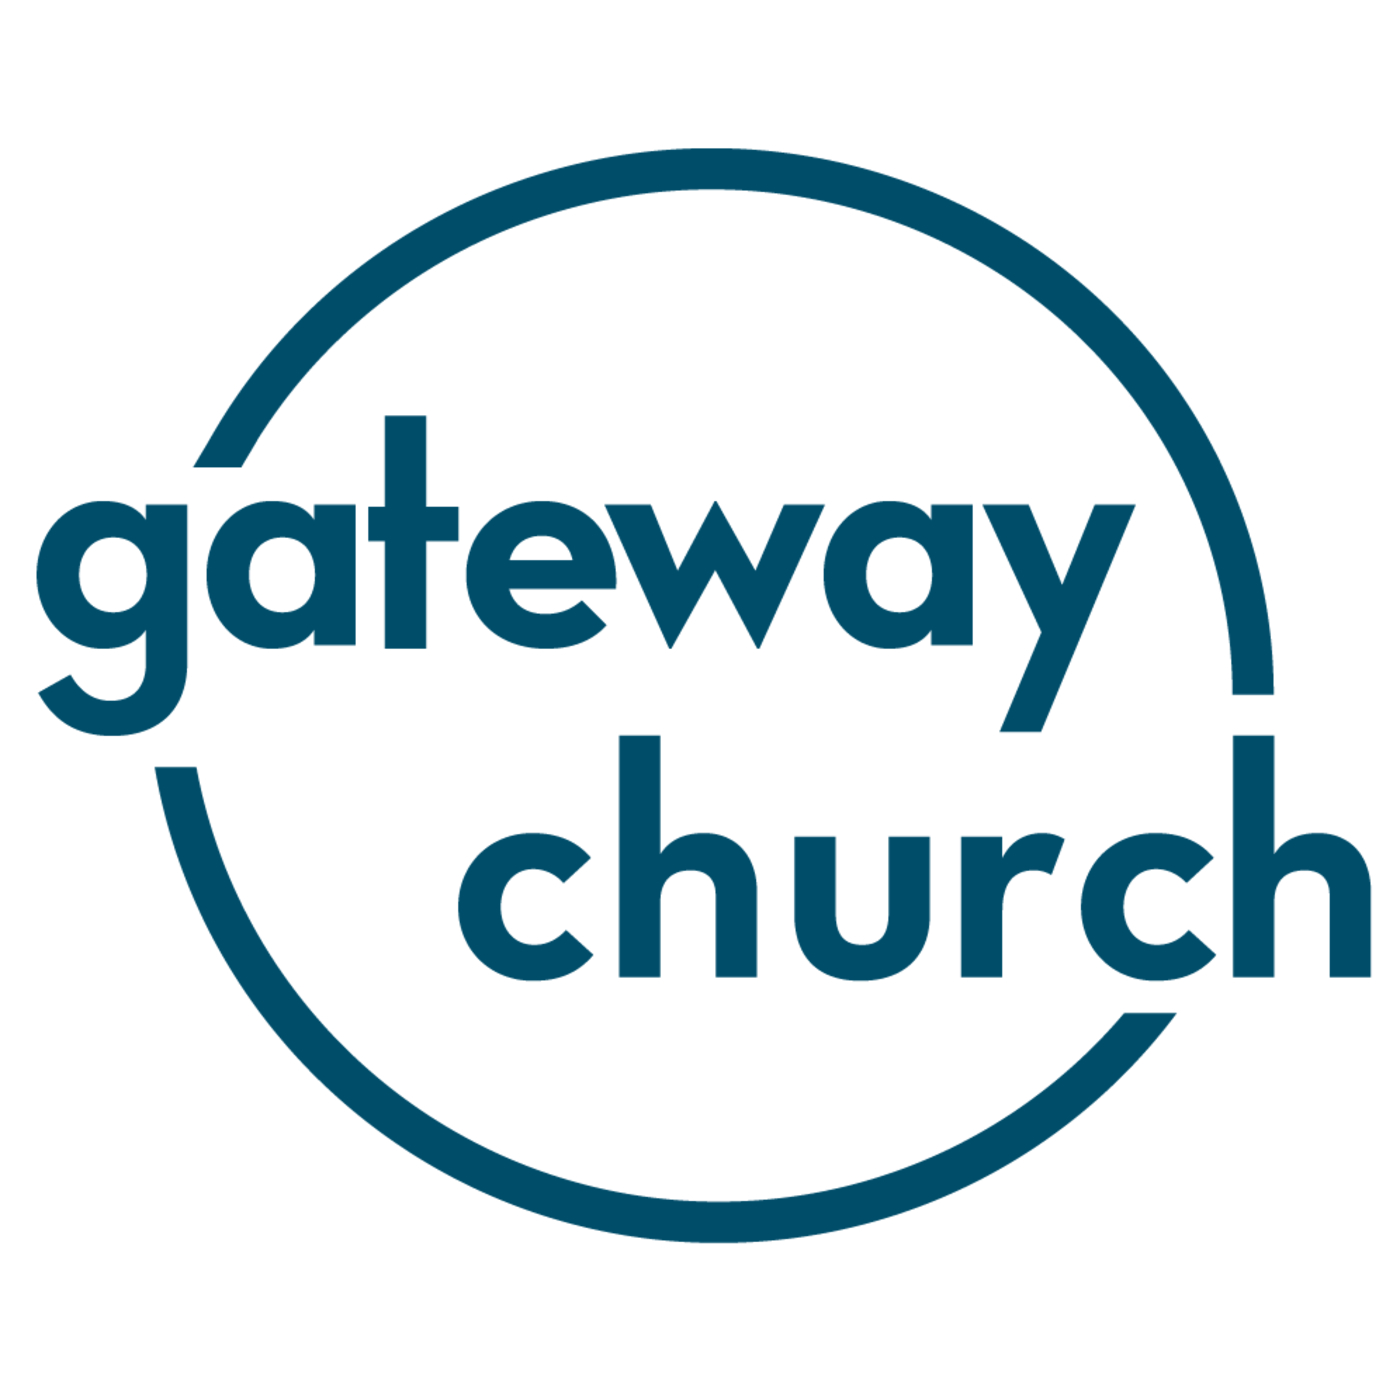 Gateway Church - Sermon Podcast